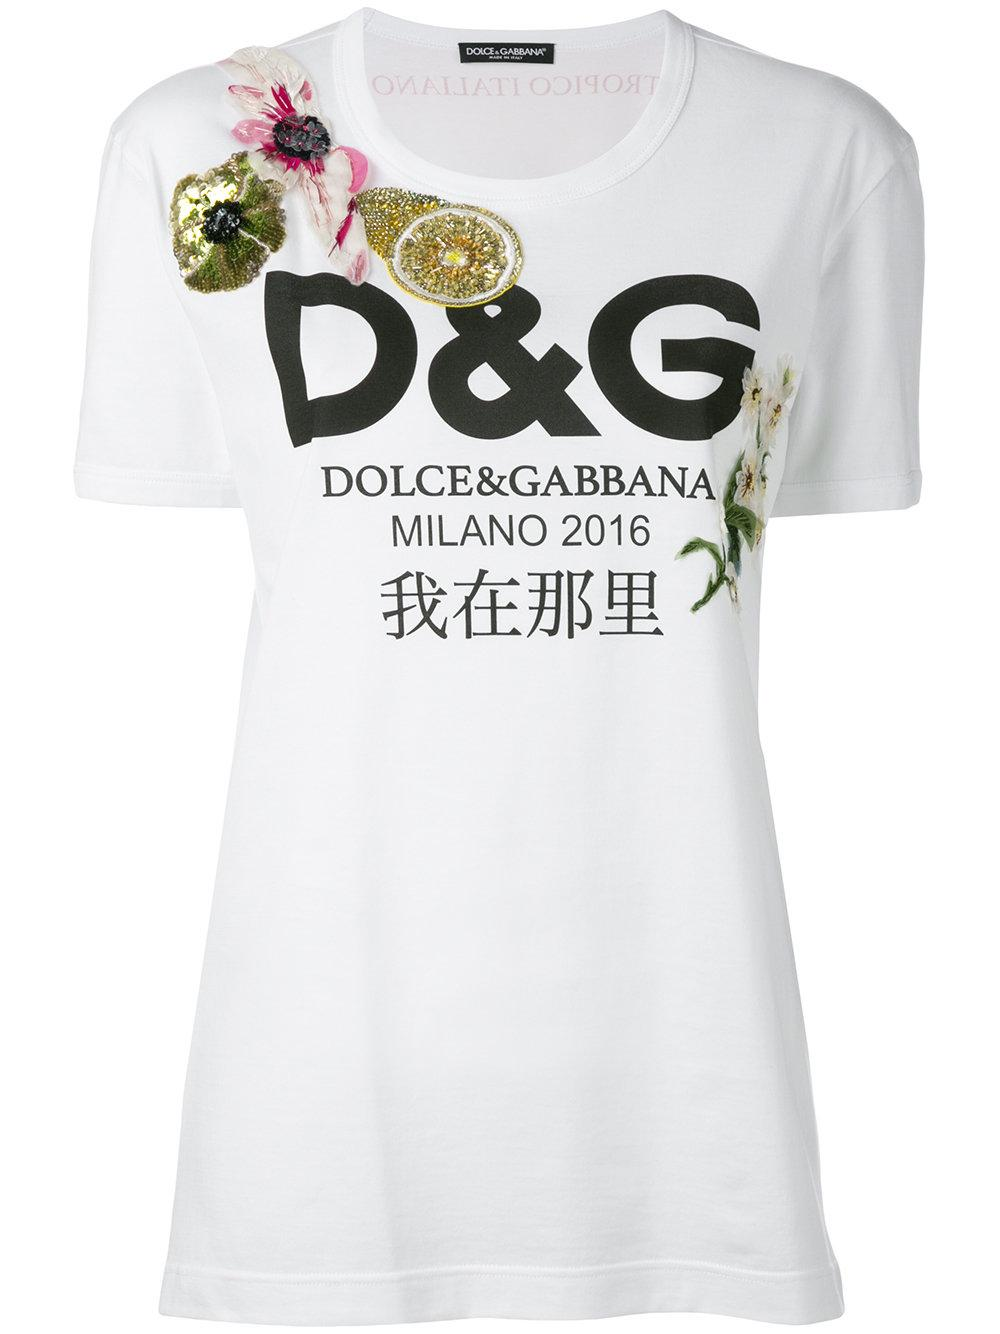 lyst dolce gabbana floral logo t shirt in white. Black Bedroom Furniture Sets. Home Design Ideas